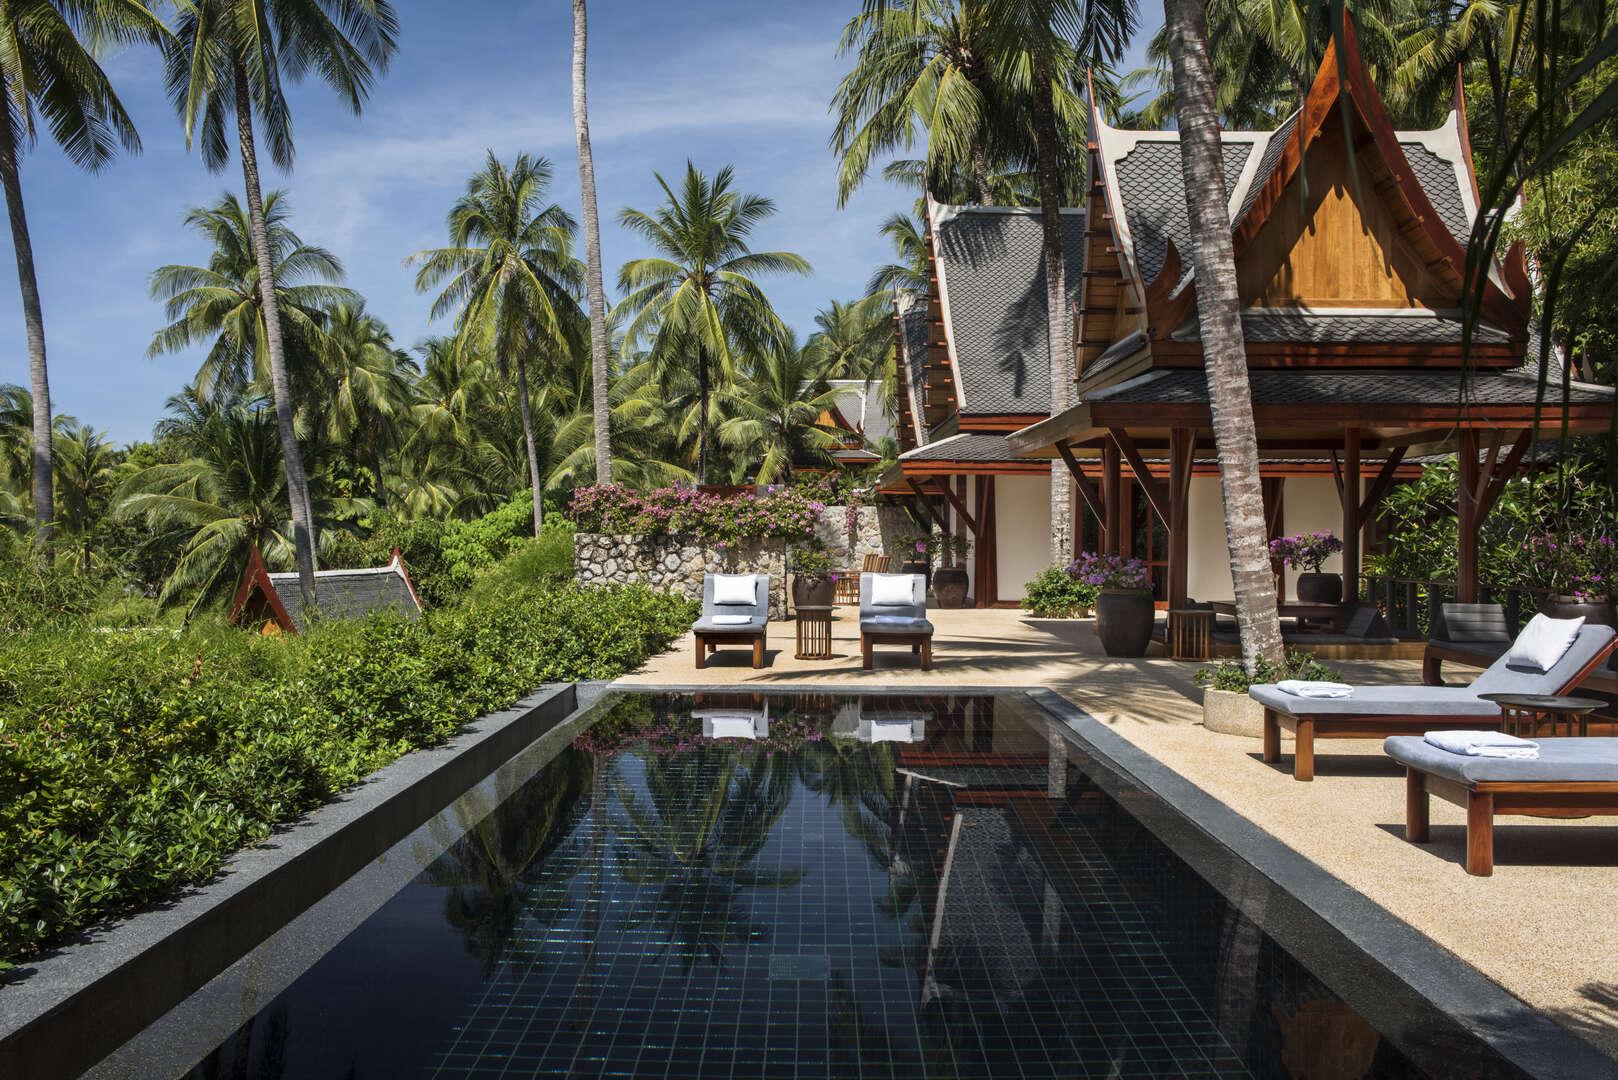 - 2 BDM Pool Pavilion - Image 1/4